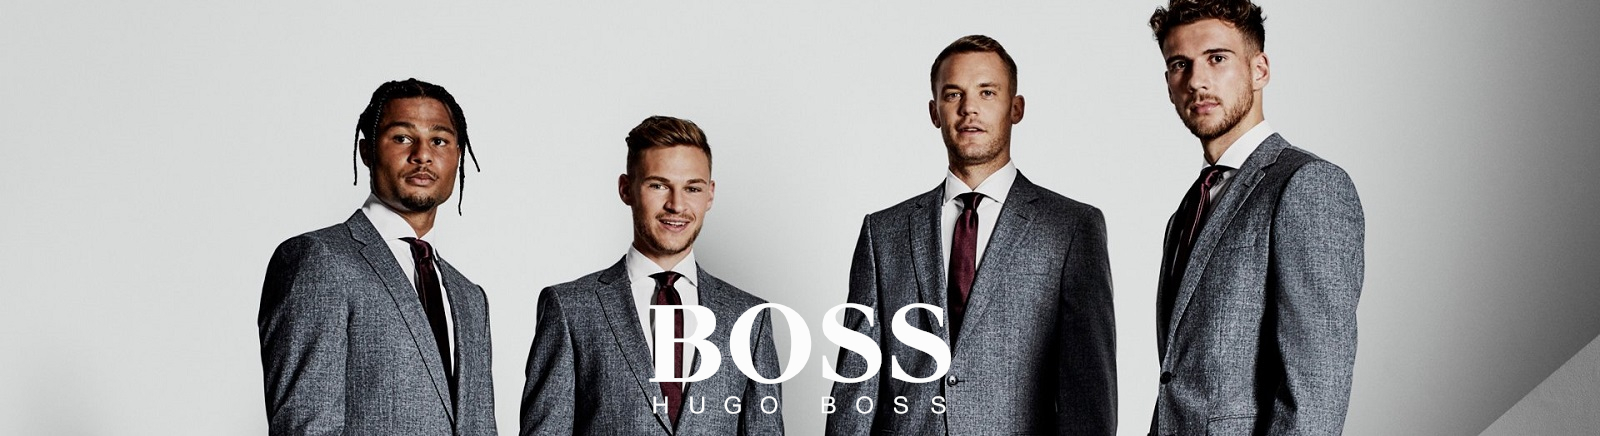 Juppen: BOSS Mokassins für Herren aus Leder online shoppen